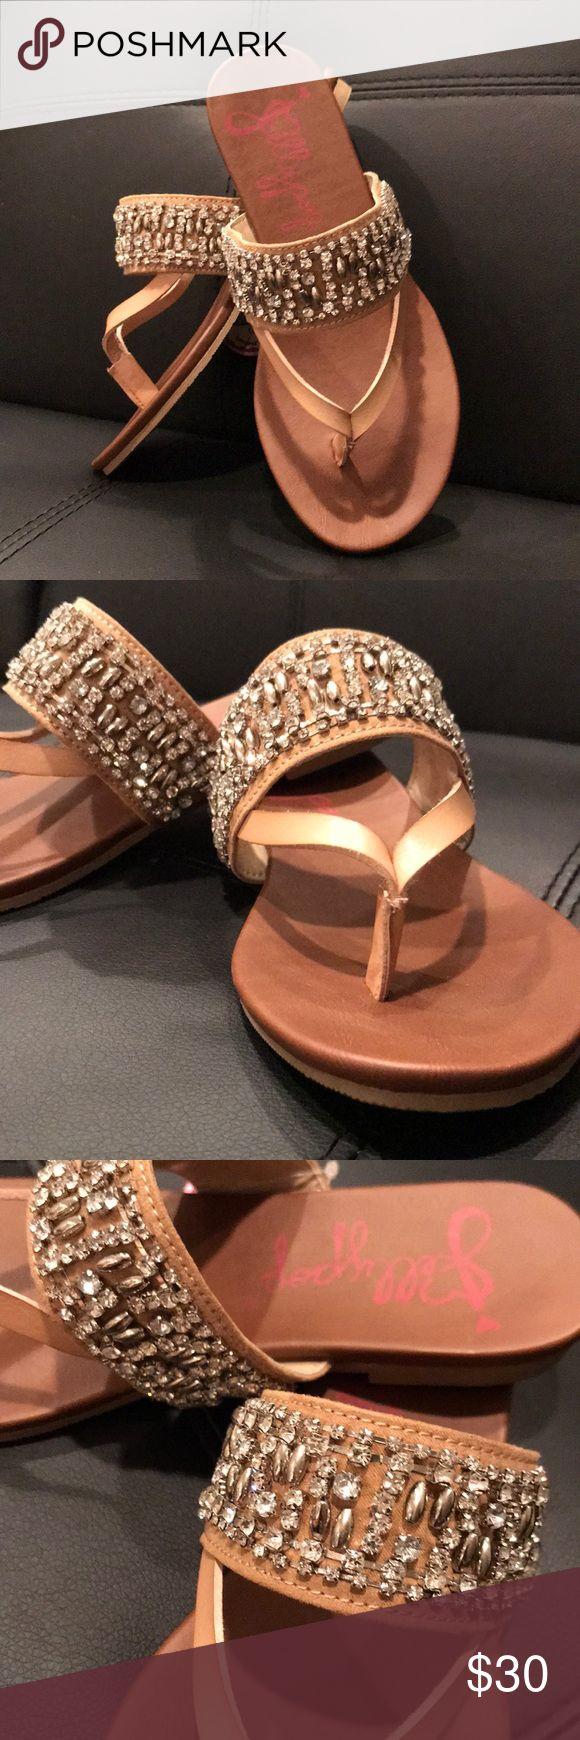 Rhinestone-Studded Sandals Rhinestone-Studded Sandals Jellypop Shoes Sandals